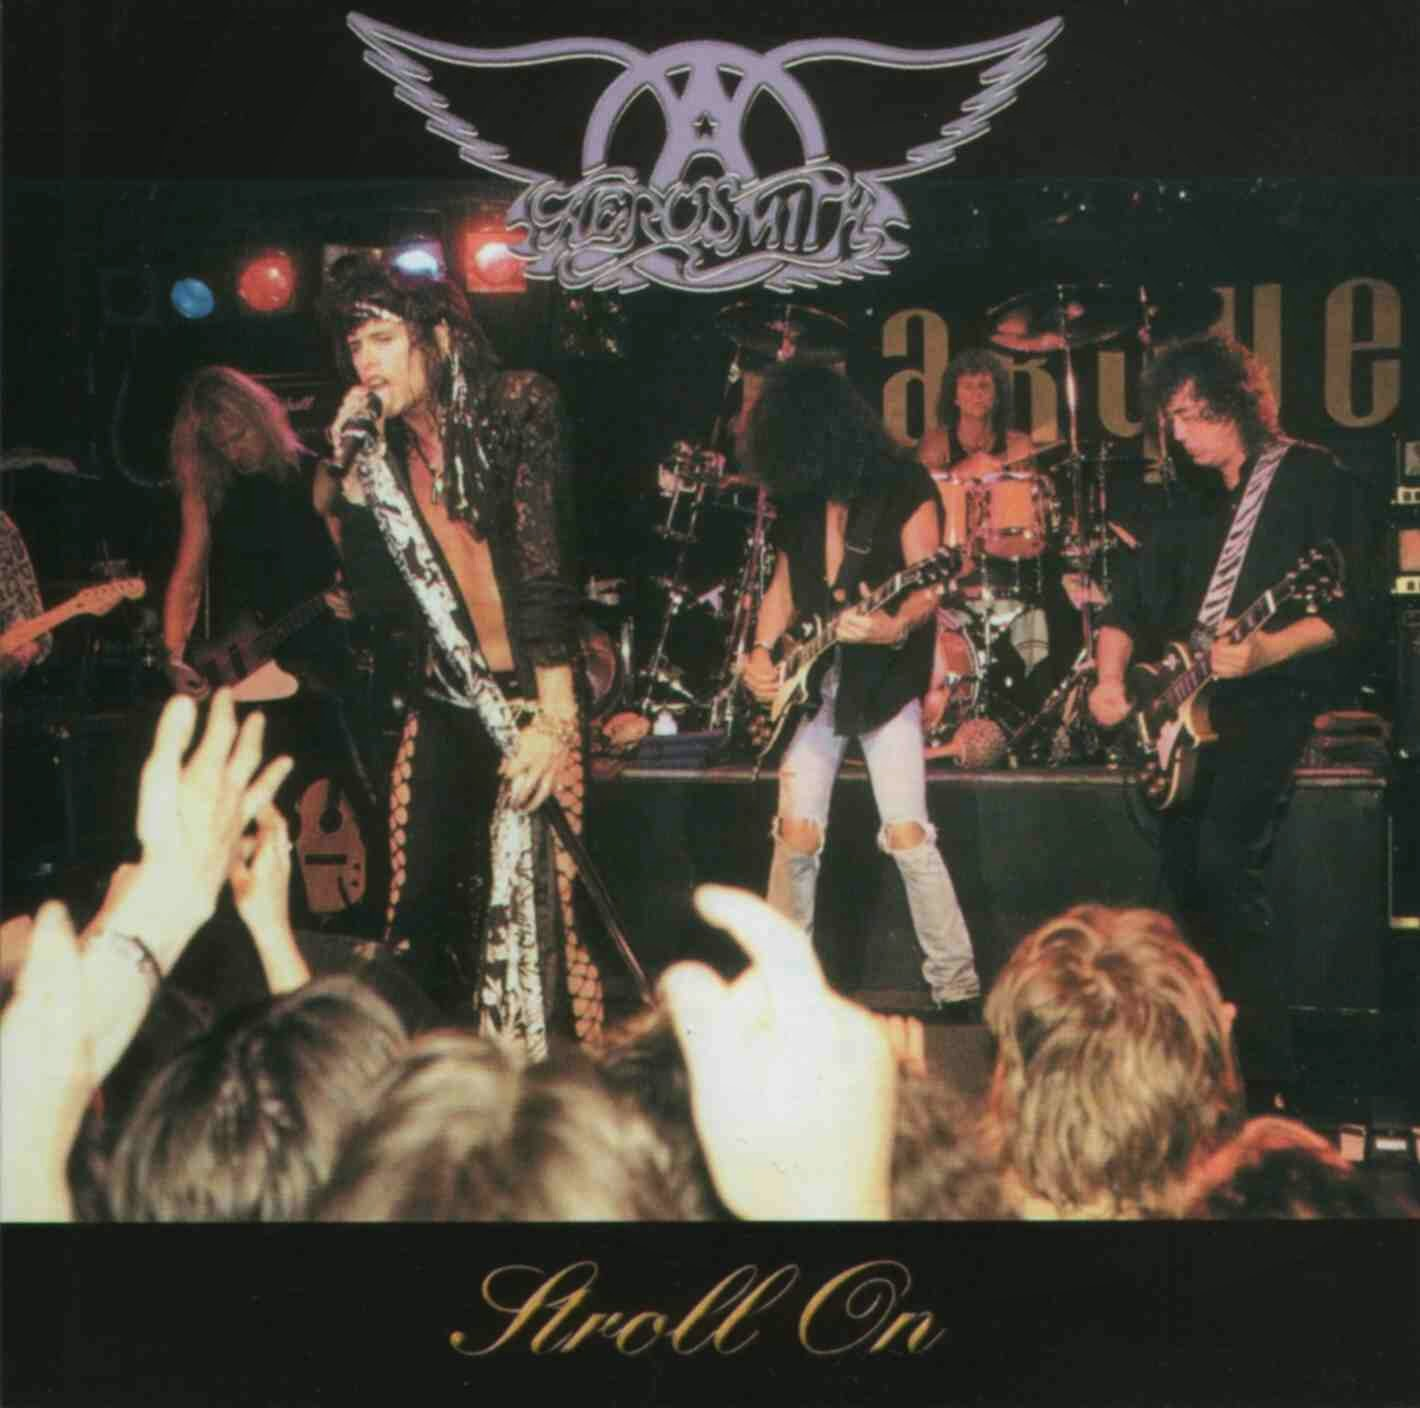 Plumdusty s page pink floyd 1975 06 12 spectrum theater philadelphia - Aerosmith Stroll On